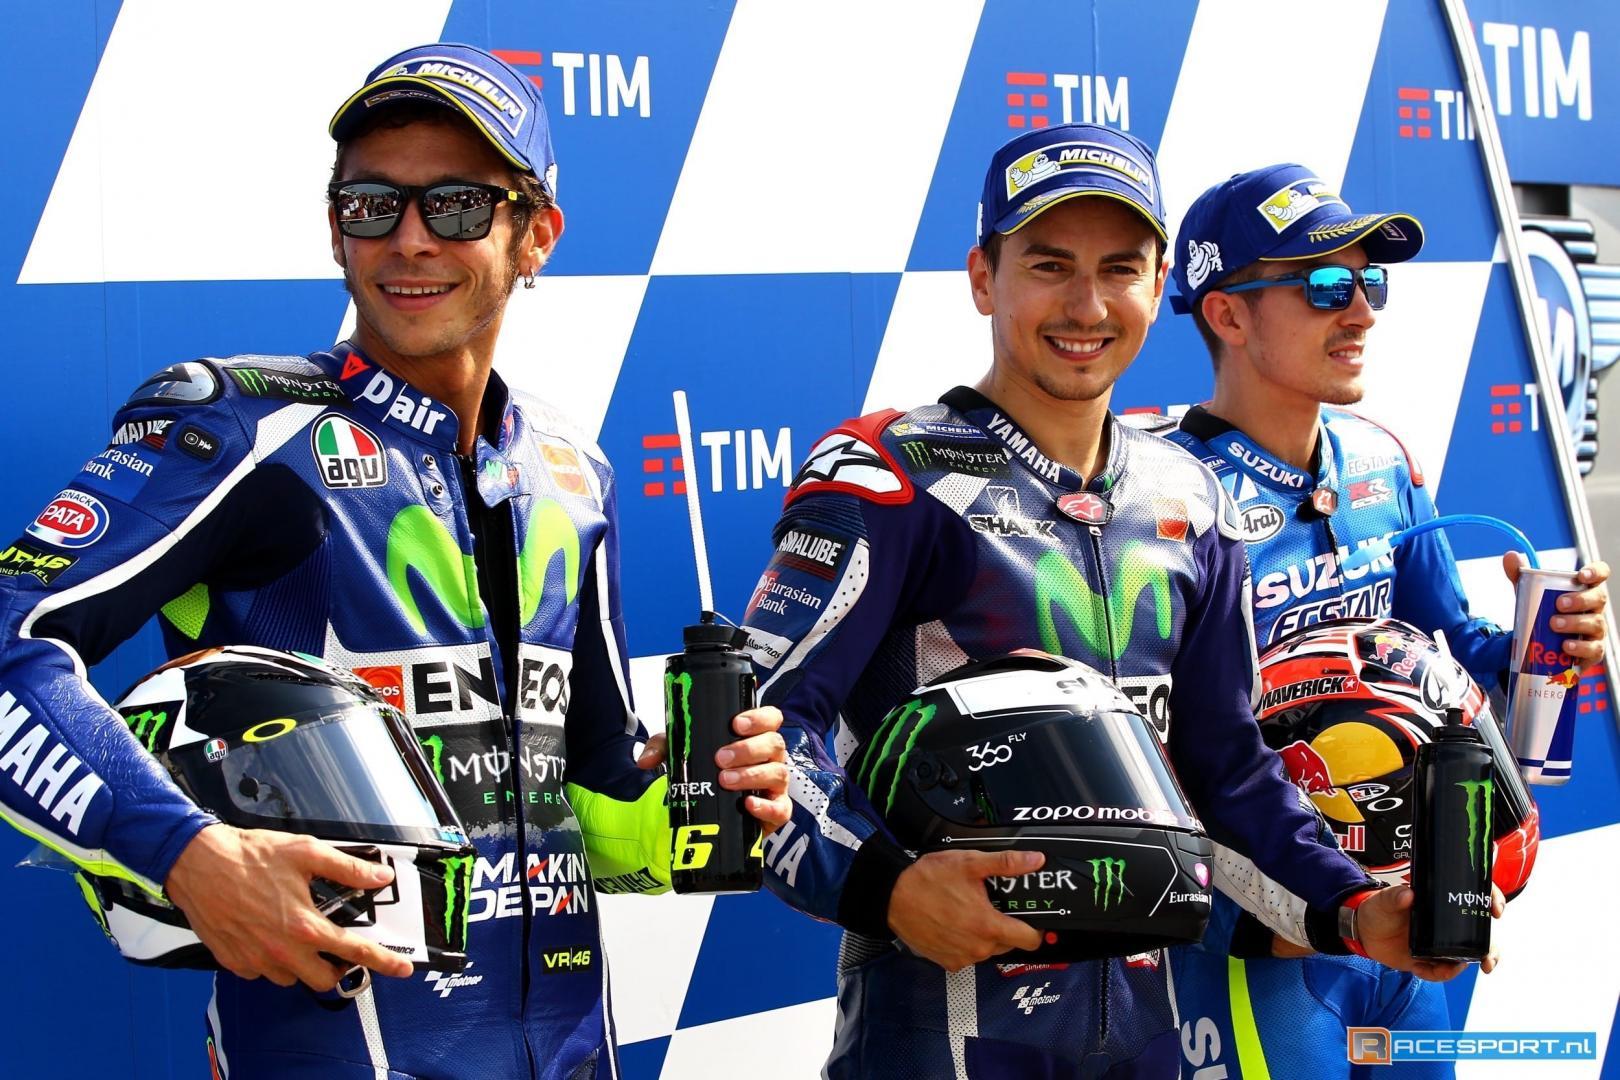 Valentino Rossi, Jorge Lorenzo dan Vinales di podium